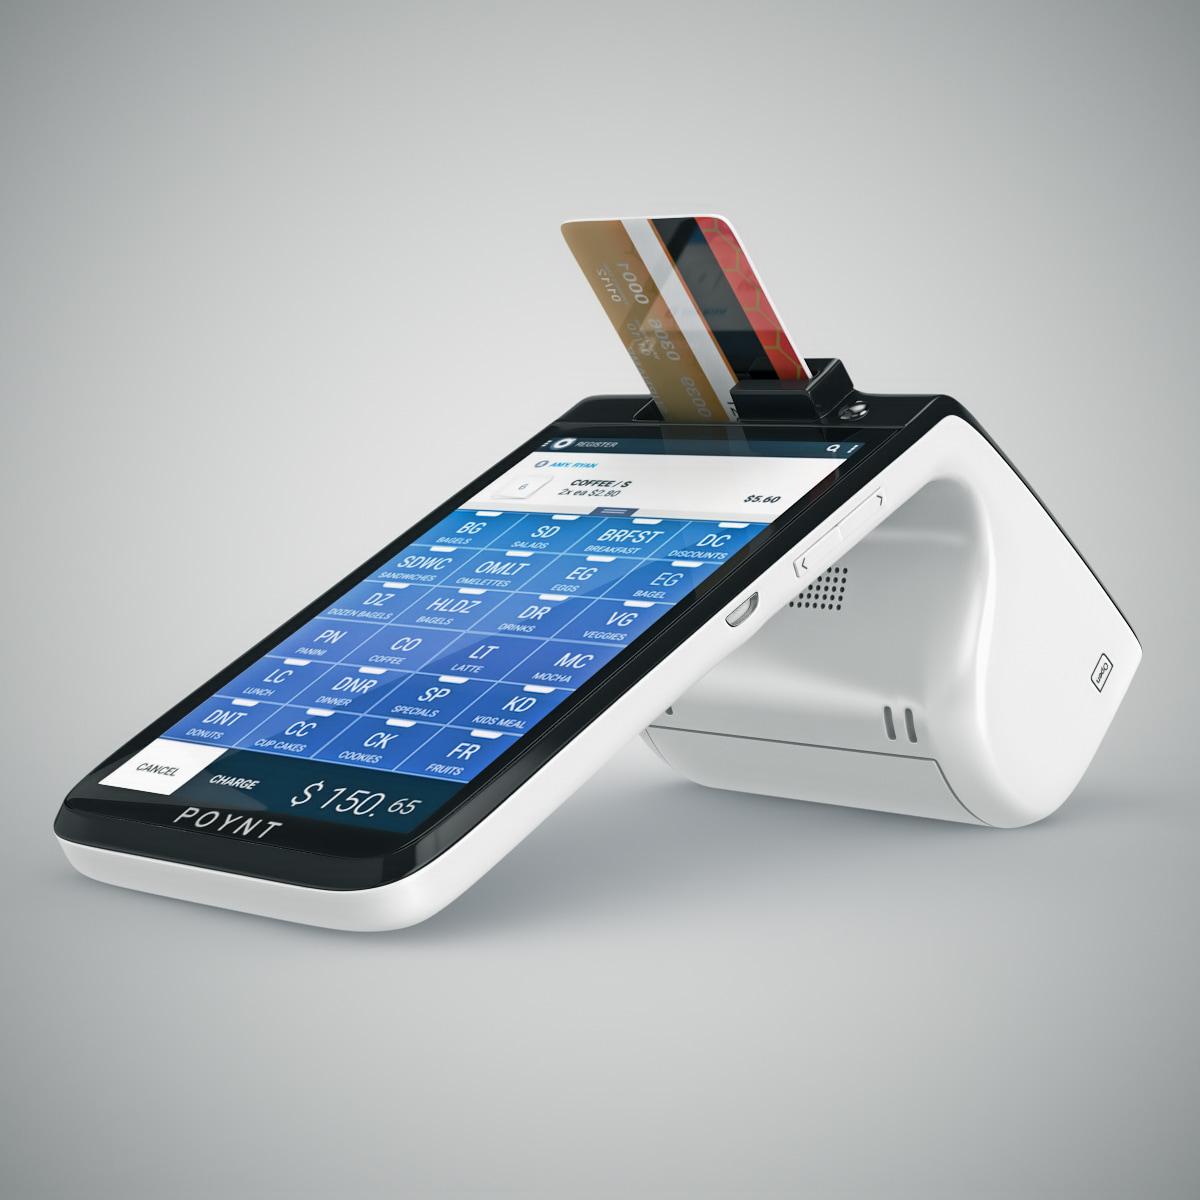 poynt smart payment terminal max